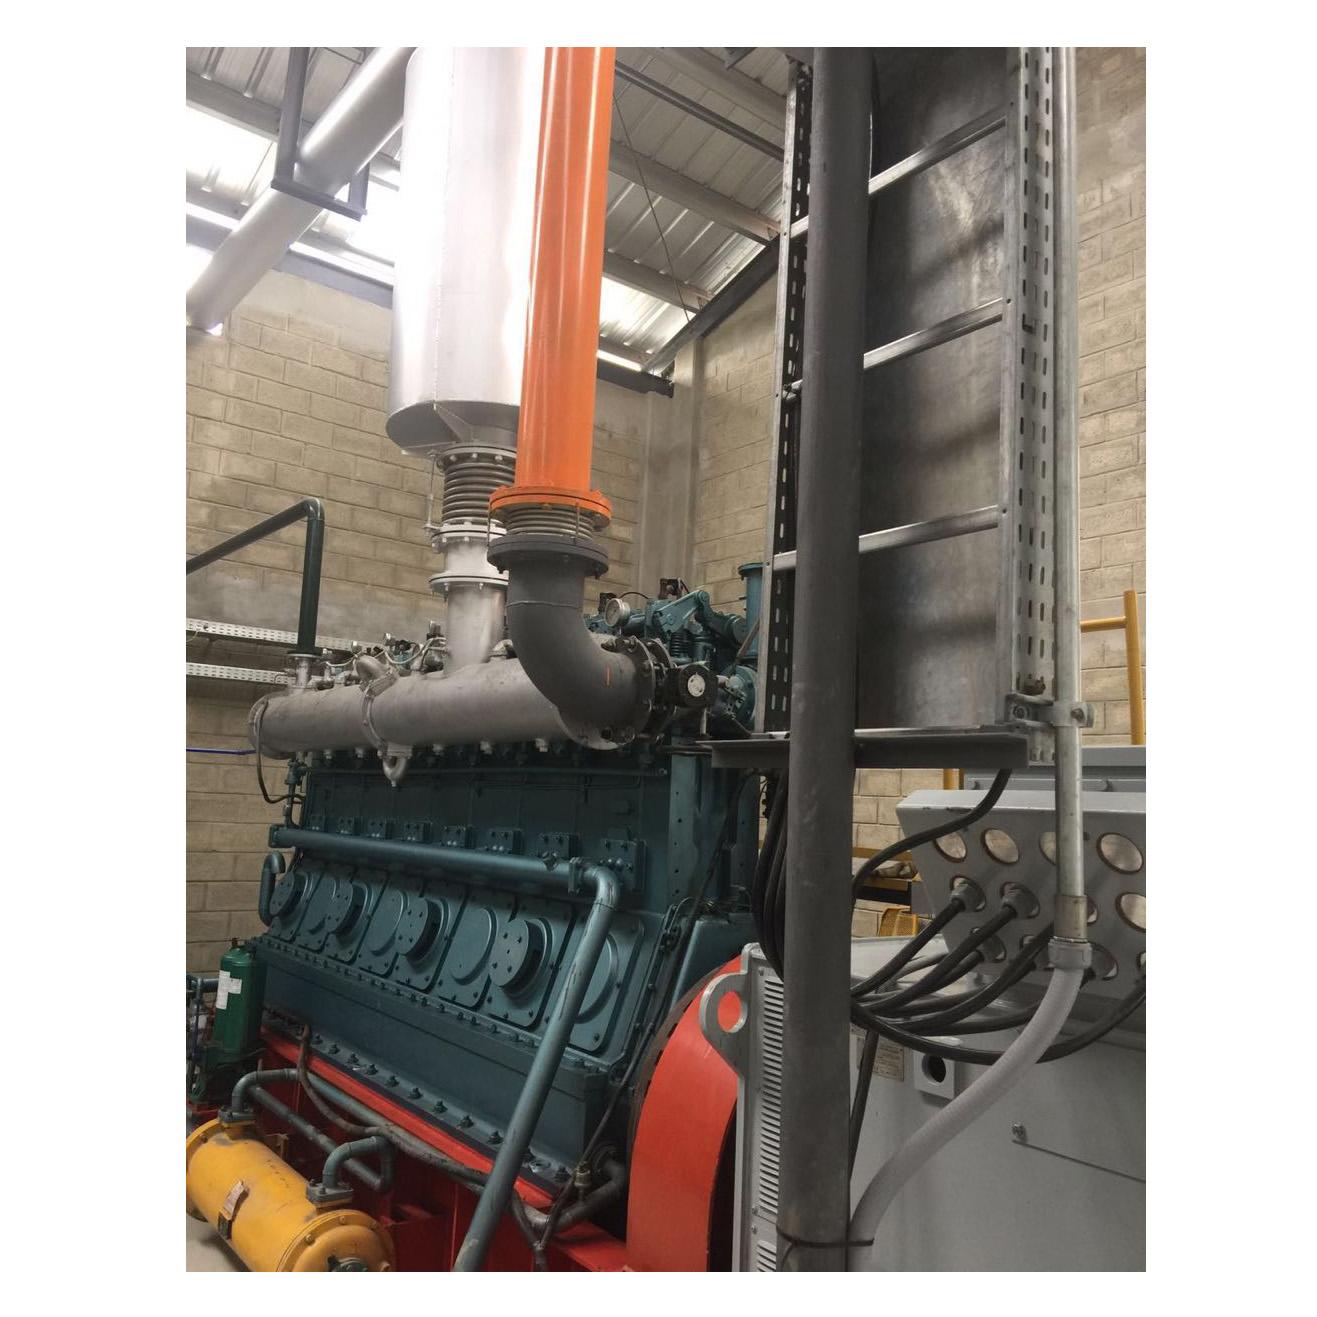 Biomass gasifier, Biomass gasification wood straw rice husk power plant